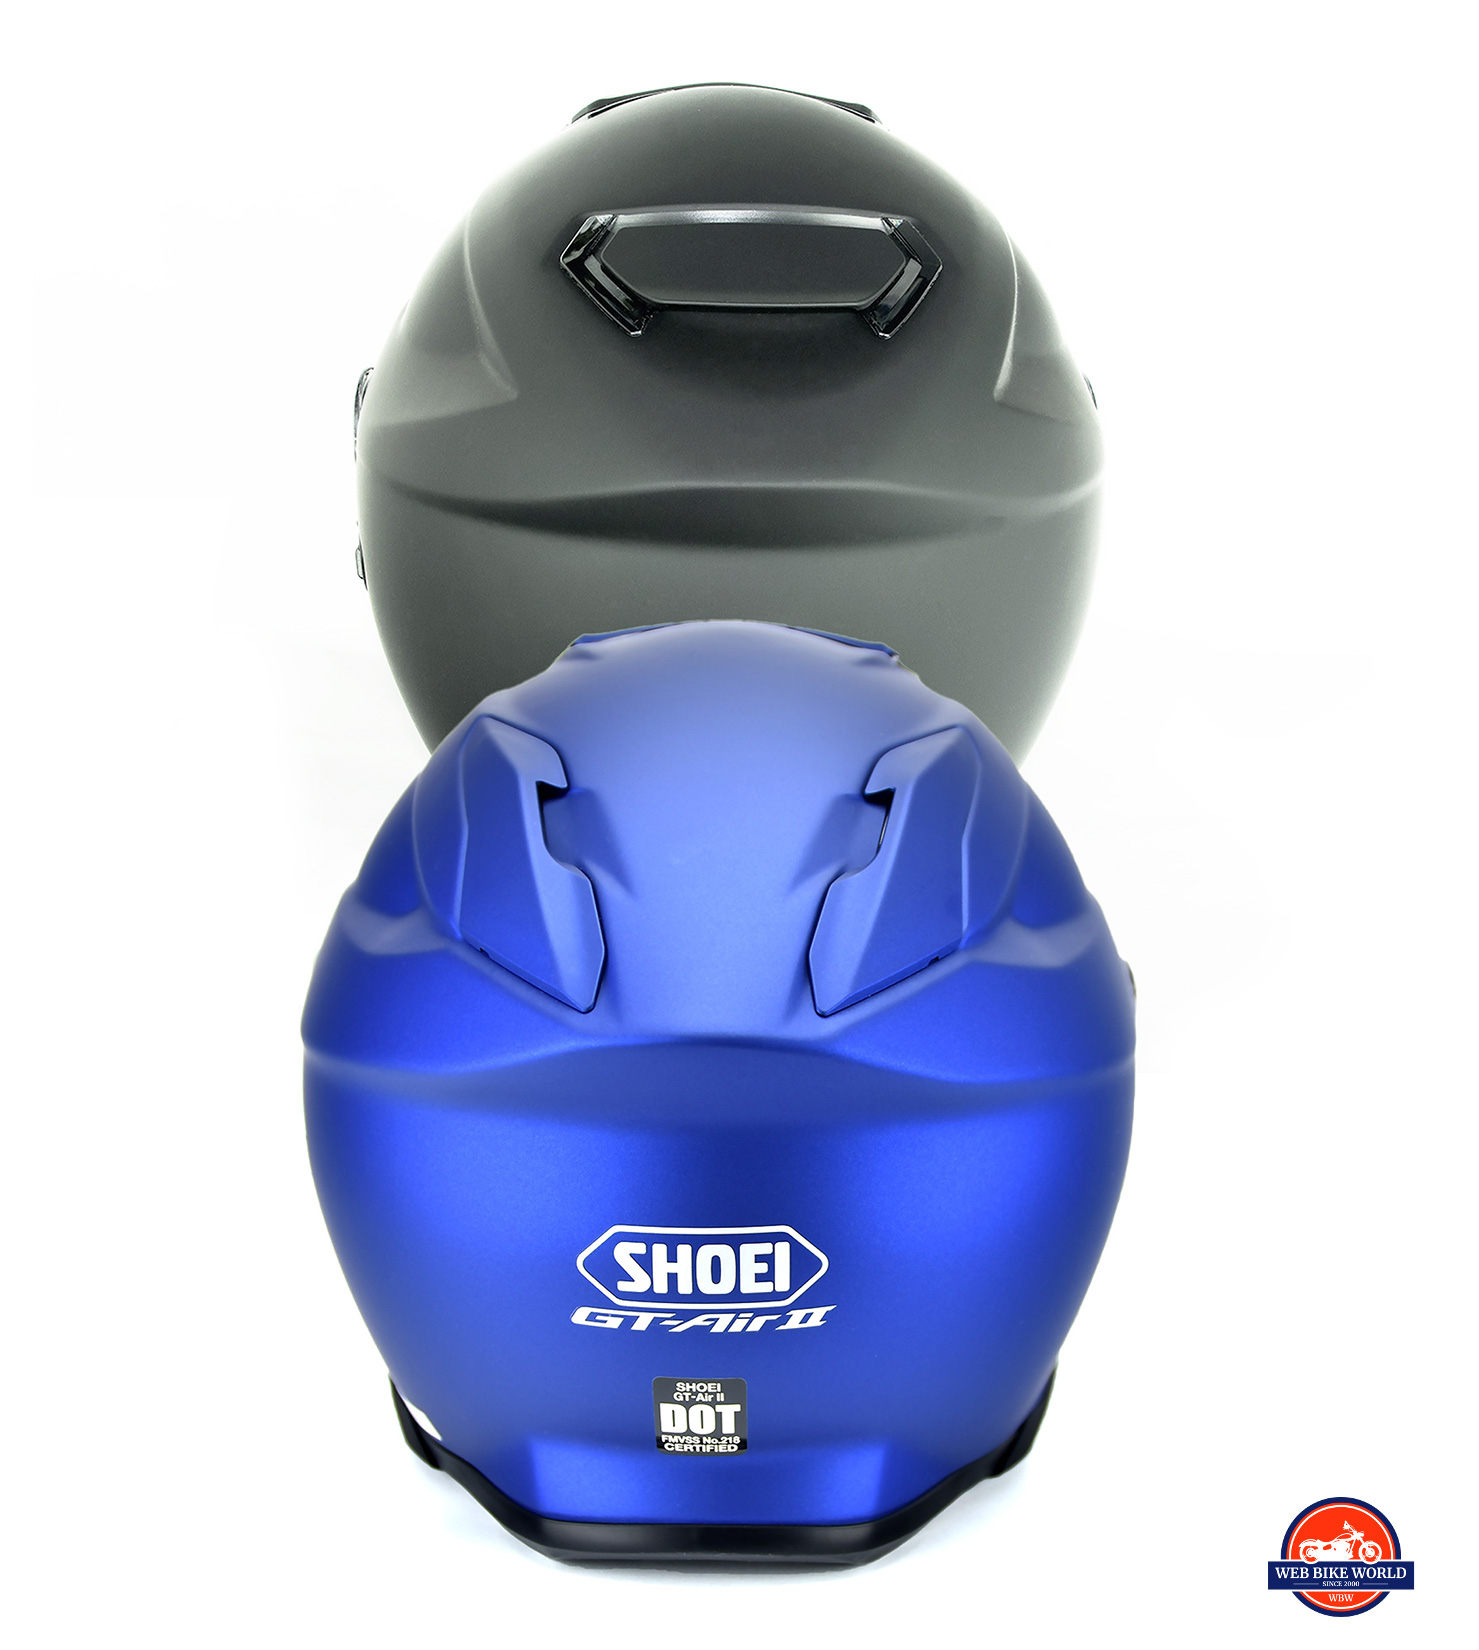 GTAir vs GTA II shell width.